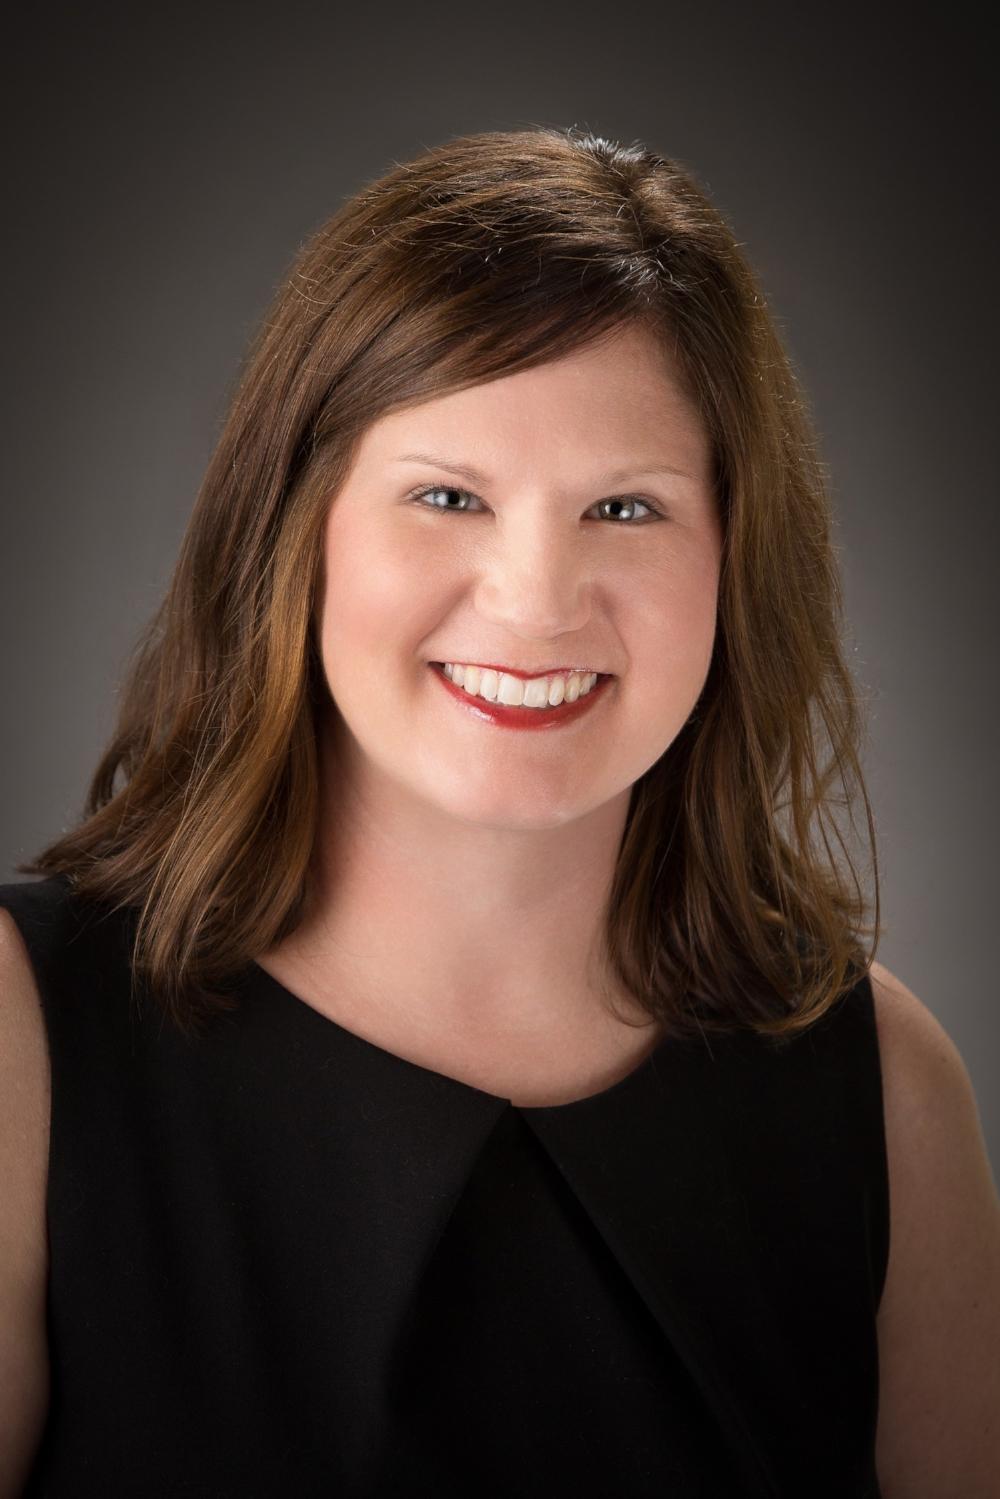 AUTHOR: Lisa Groon, Founder Ovo Birth Center